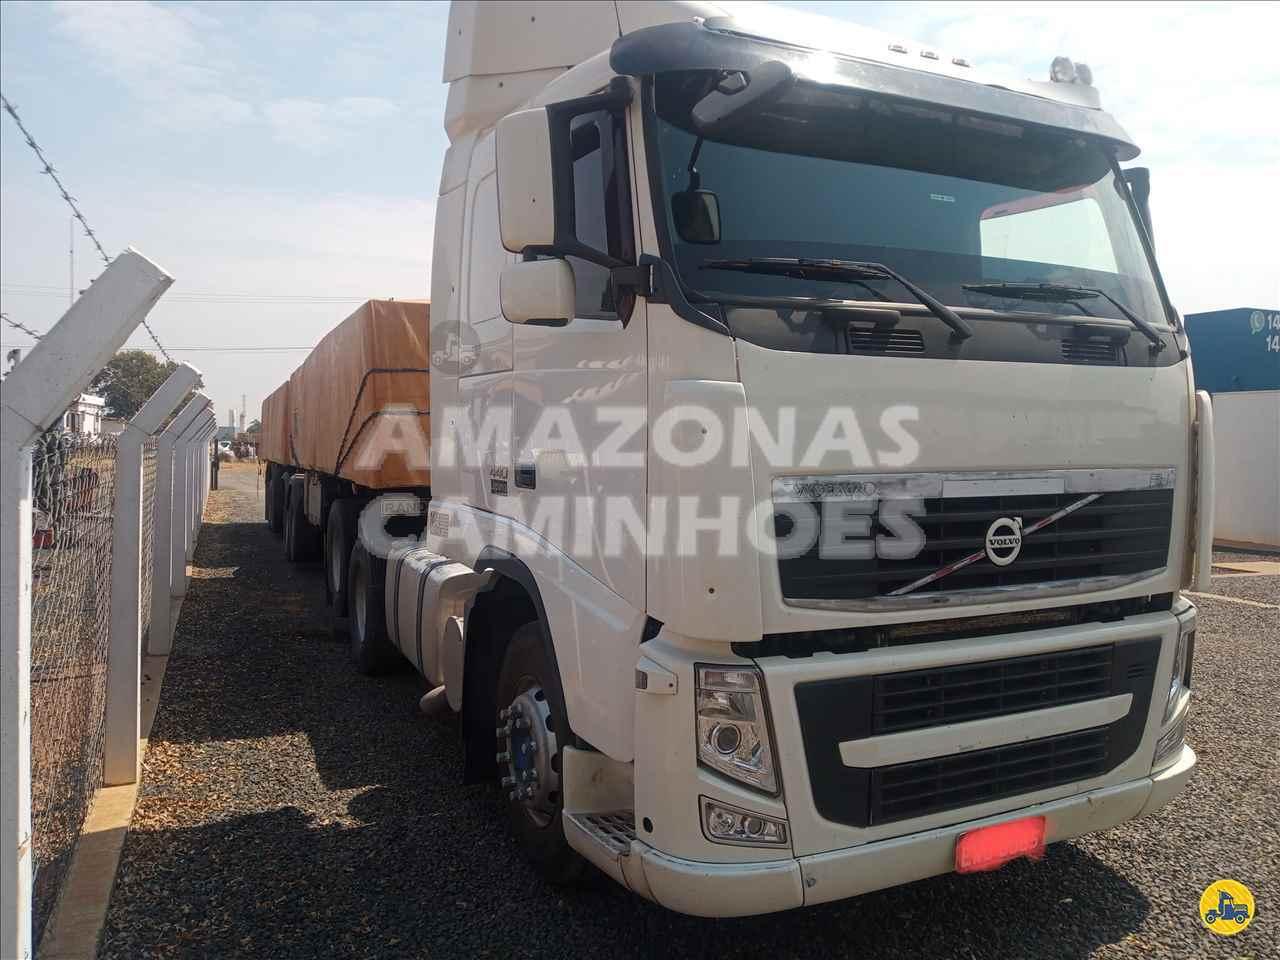 CAMINHAO VOLVO VOLVO FM 440 Cavalo Mecânico Truck 6x2 Amazonas Caminhões - SP MARILIA SÃO PAULO SP